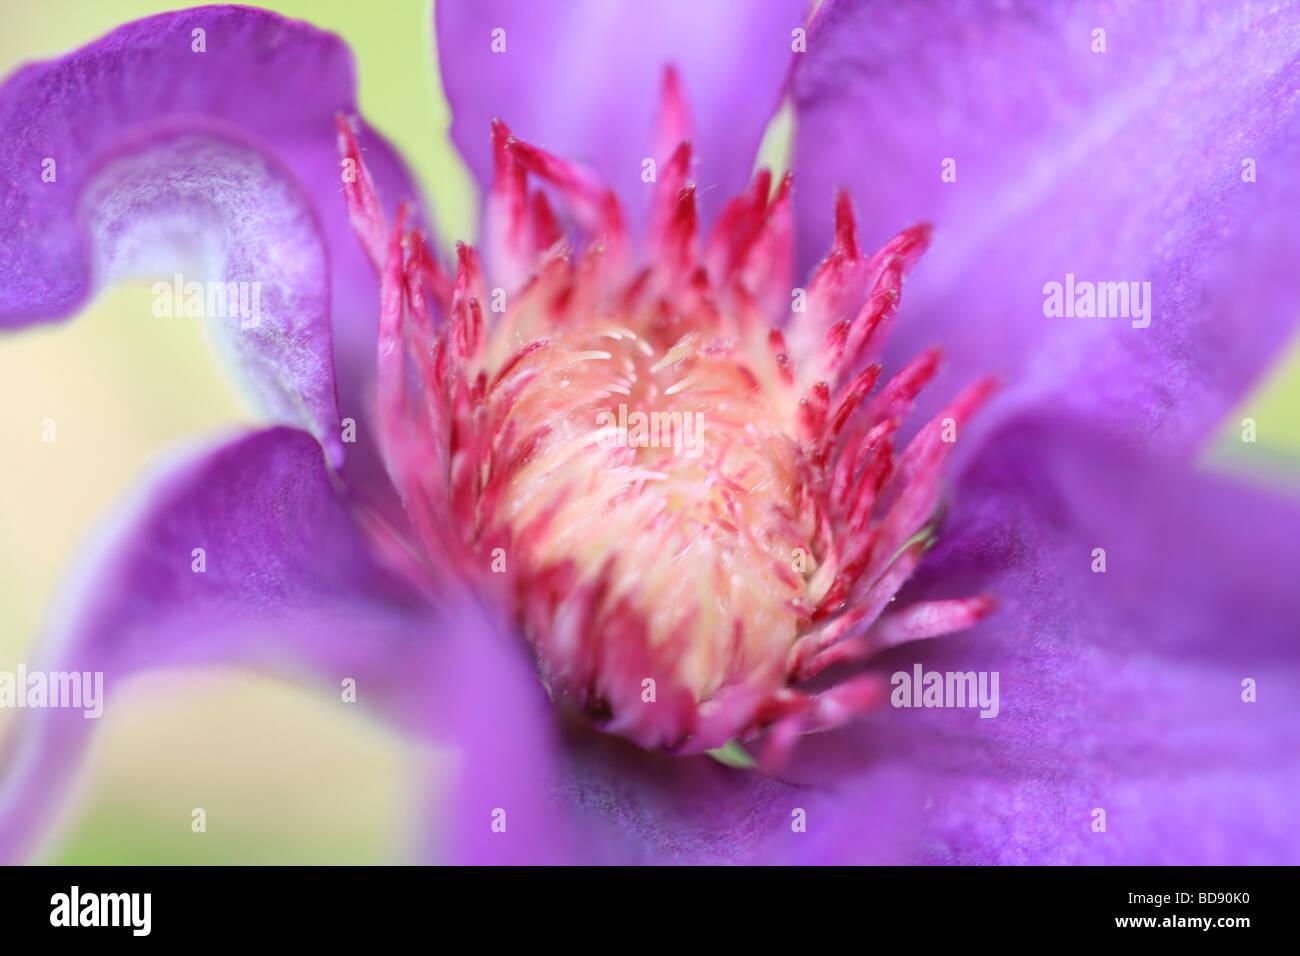 stunning clematis fine art photography Jane Ann Butler Photography JABP536 - Stock Image